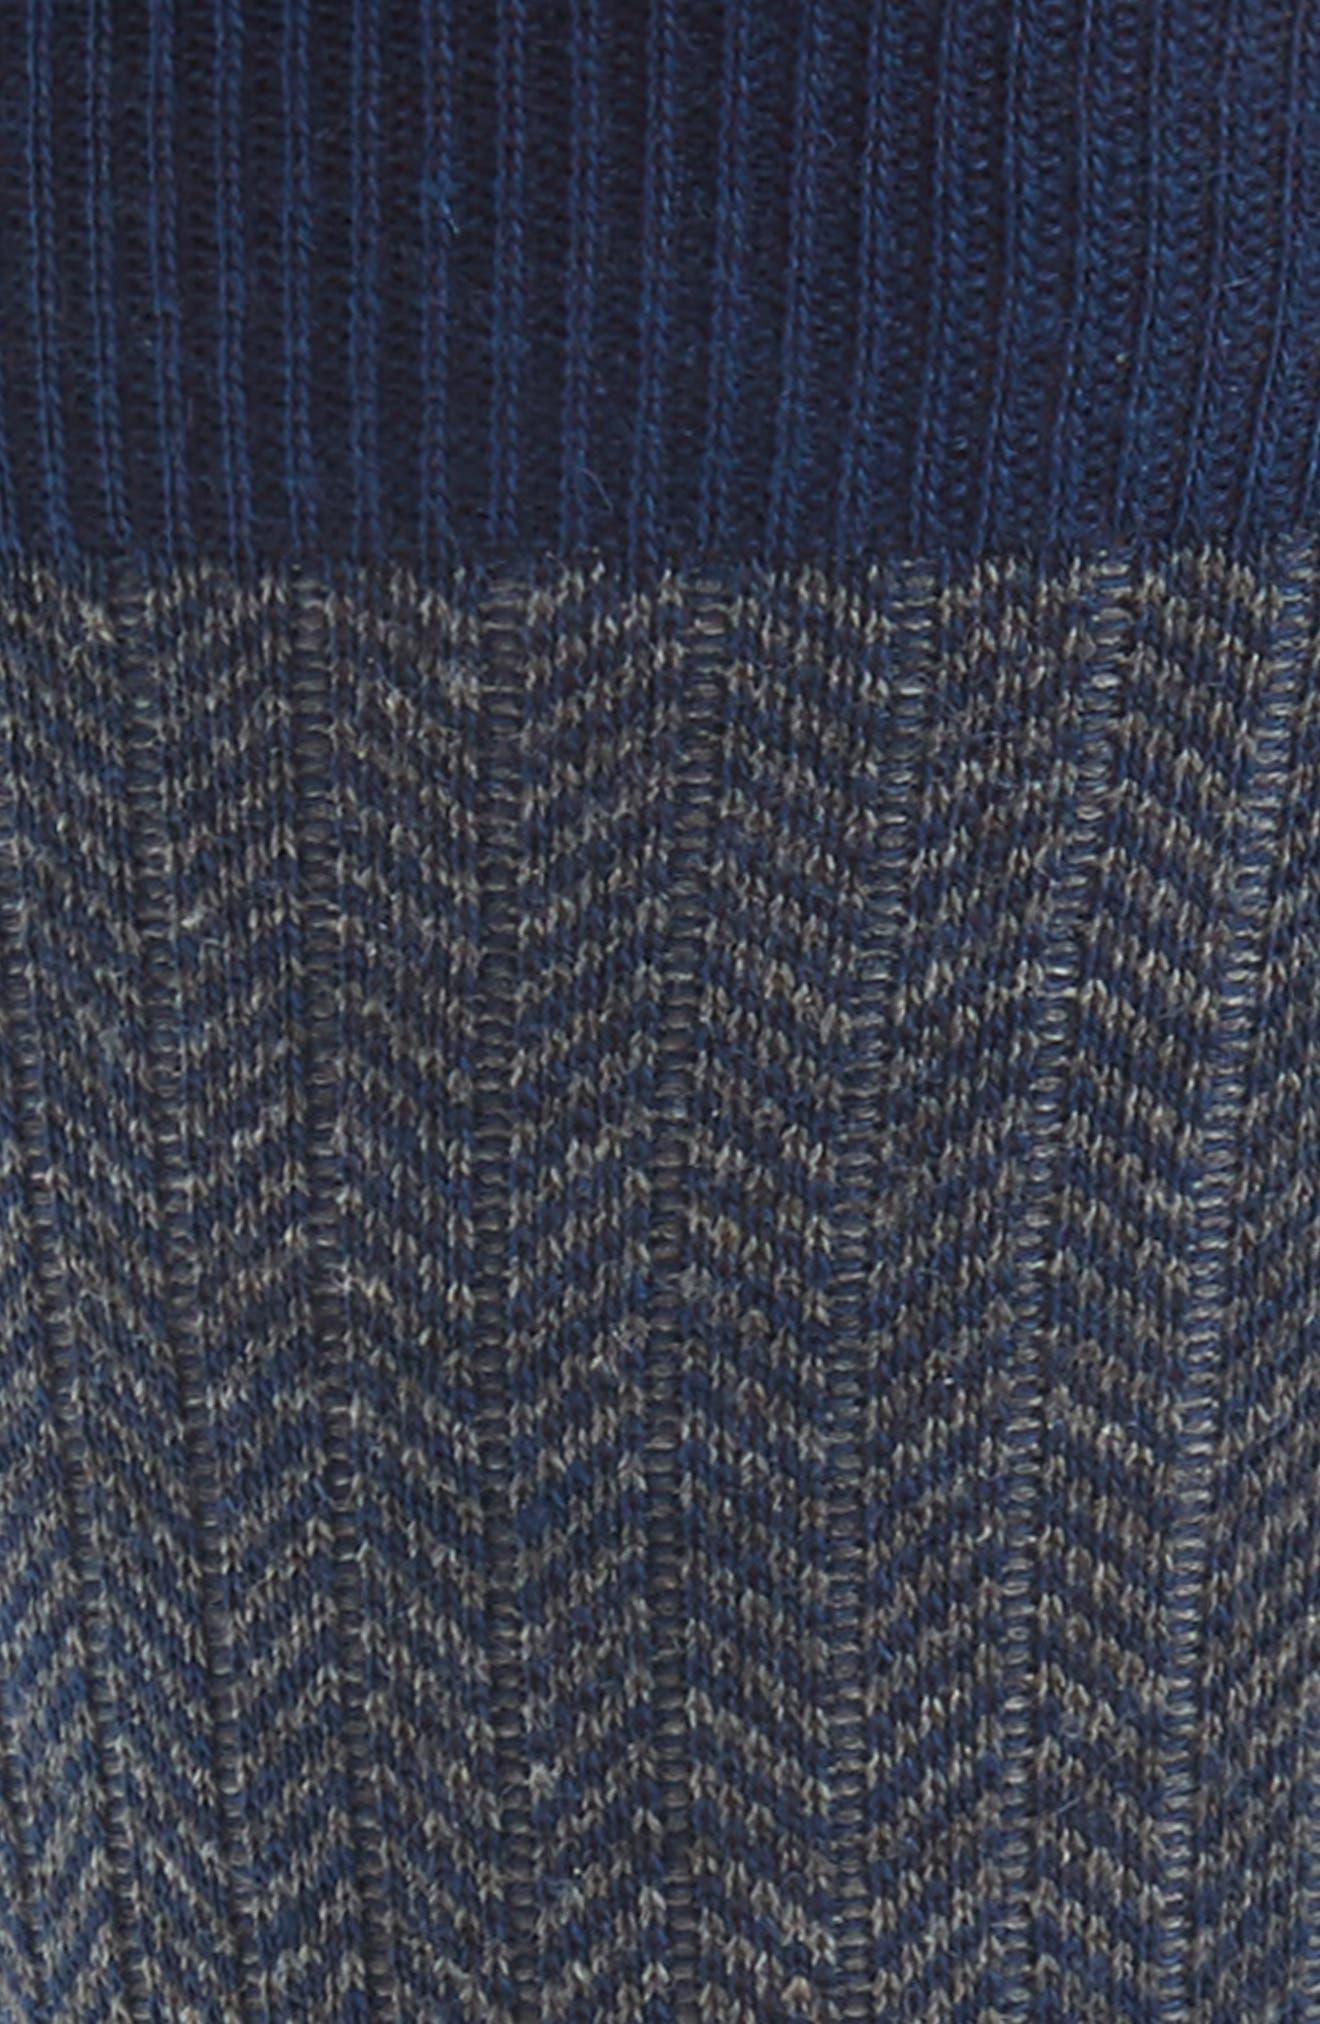 Alternate Image 2  - Pantherella '5911' Mid-Calf Dress Socks